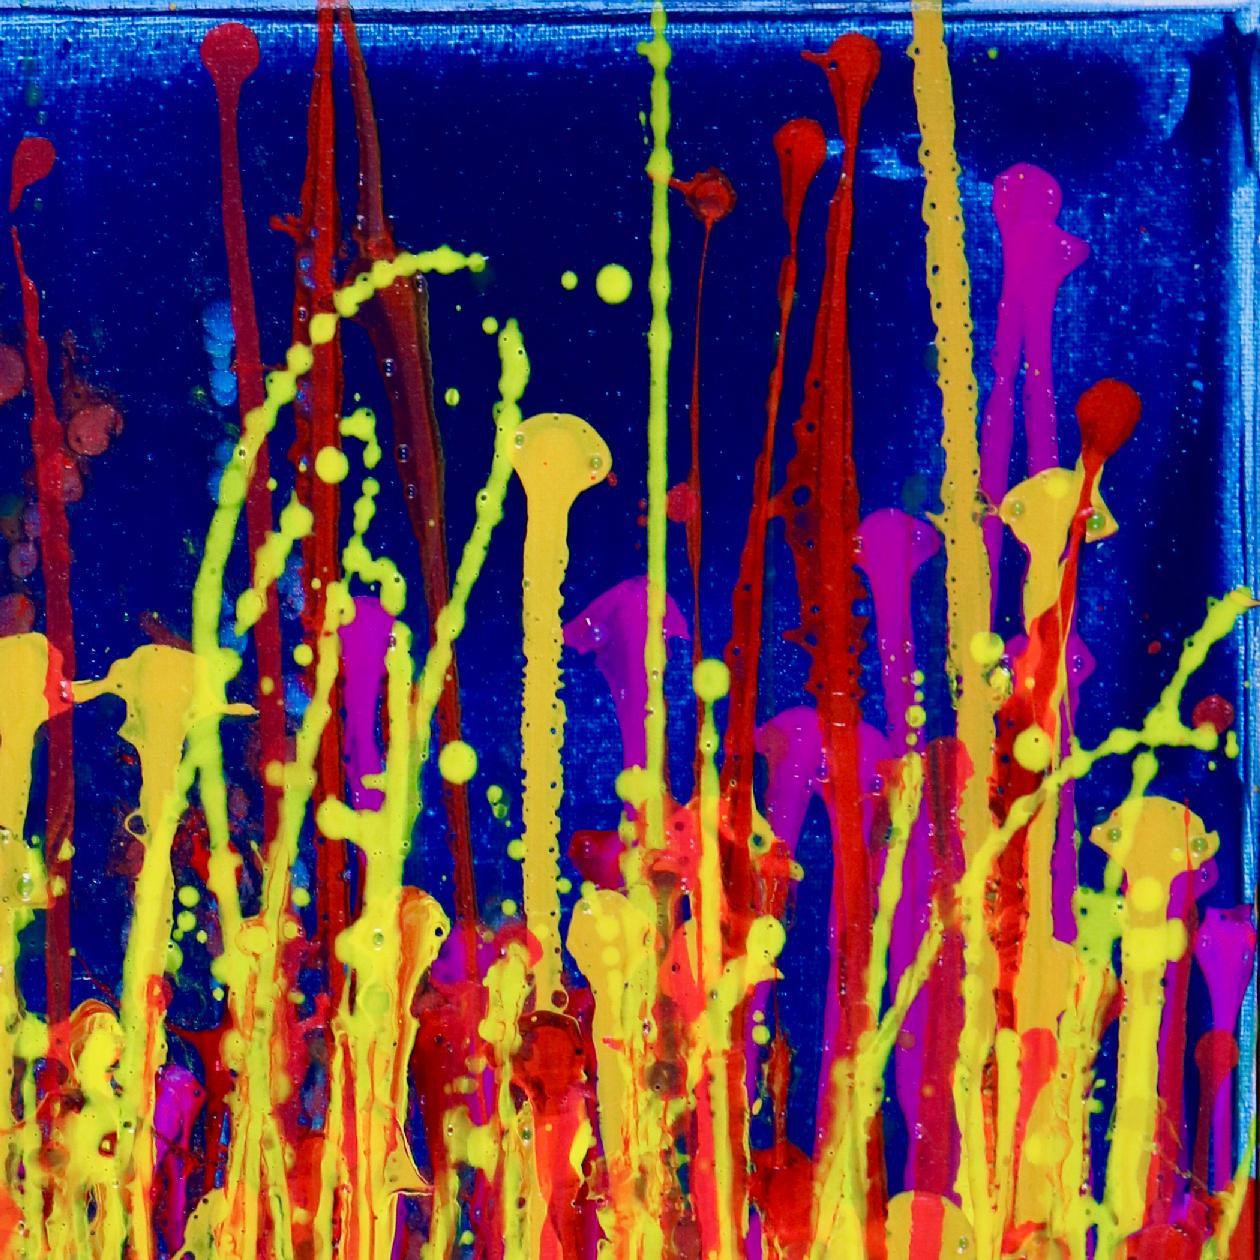 Daydream Panorama 5 (Color Retreat) (2020) by Nestor Toro